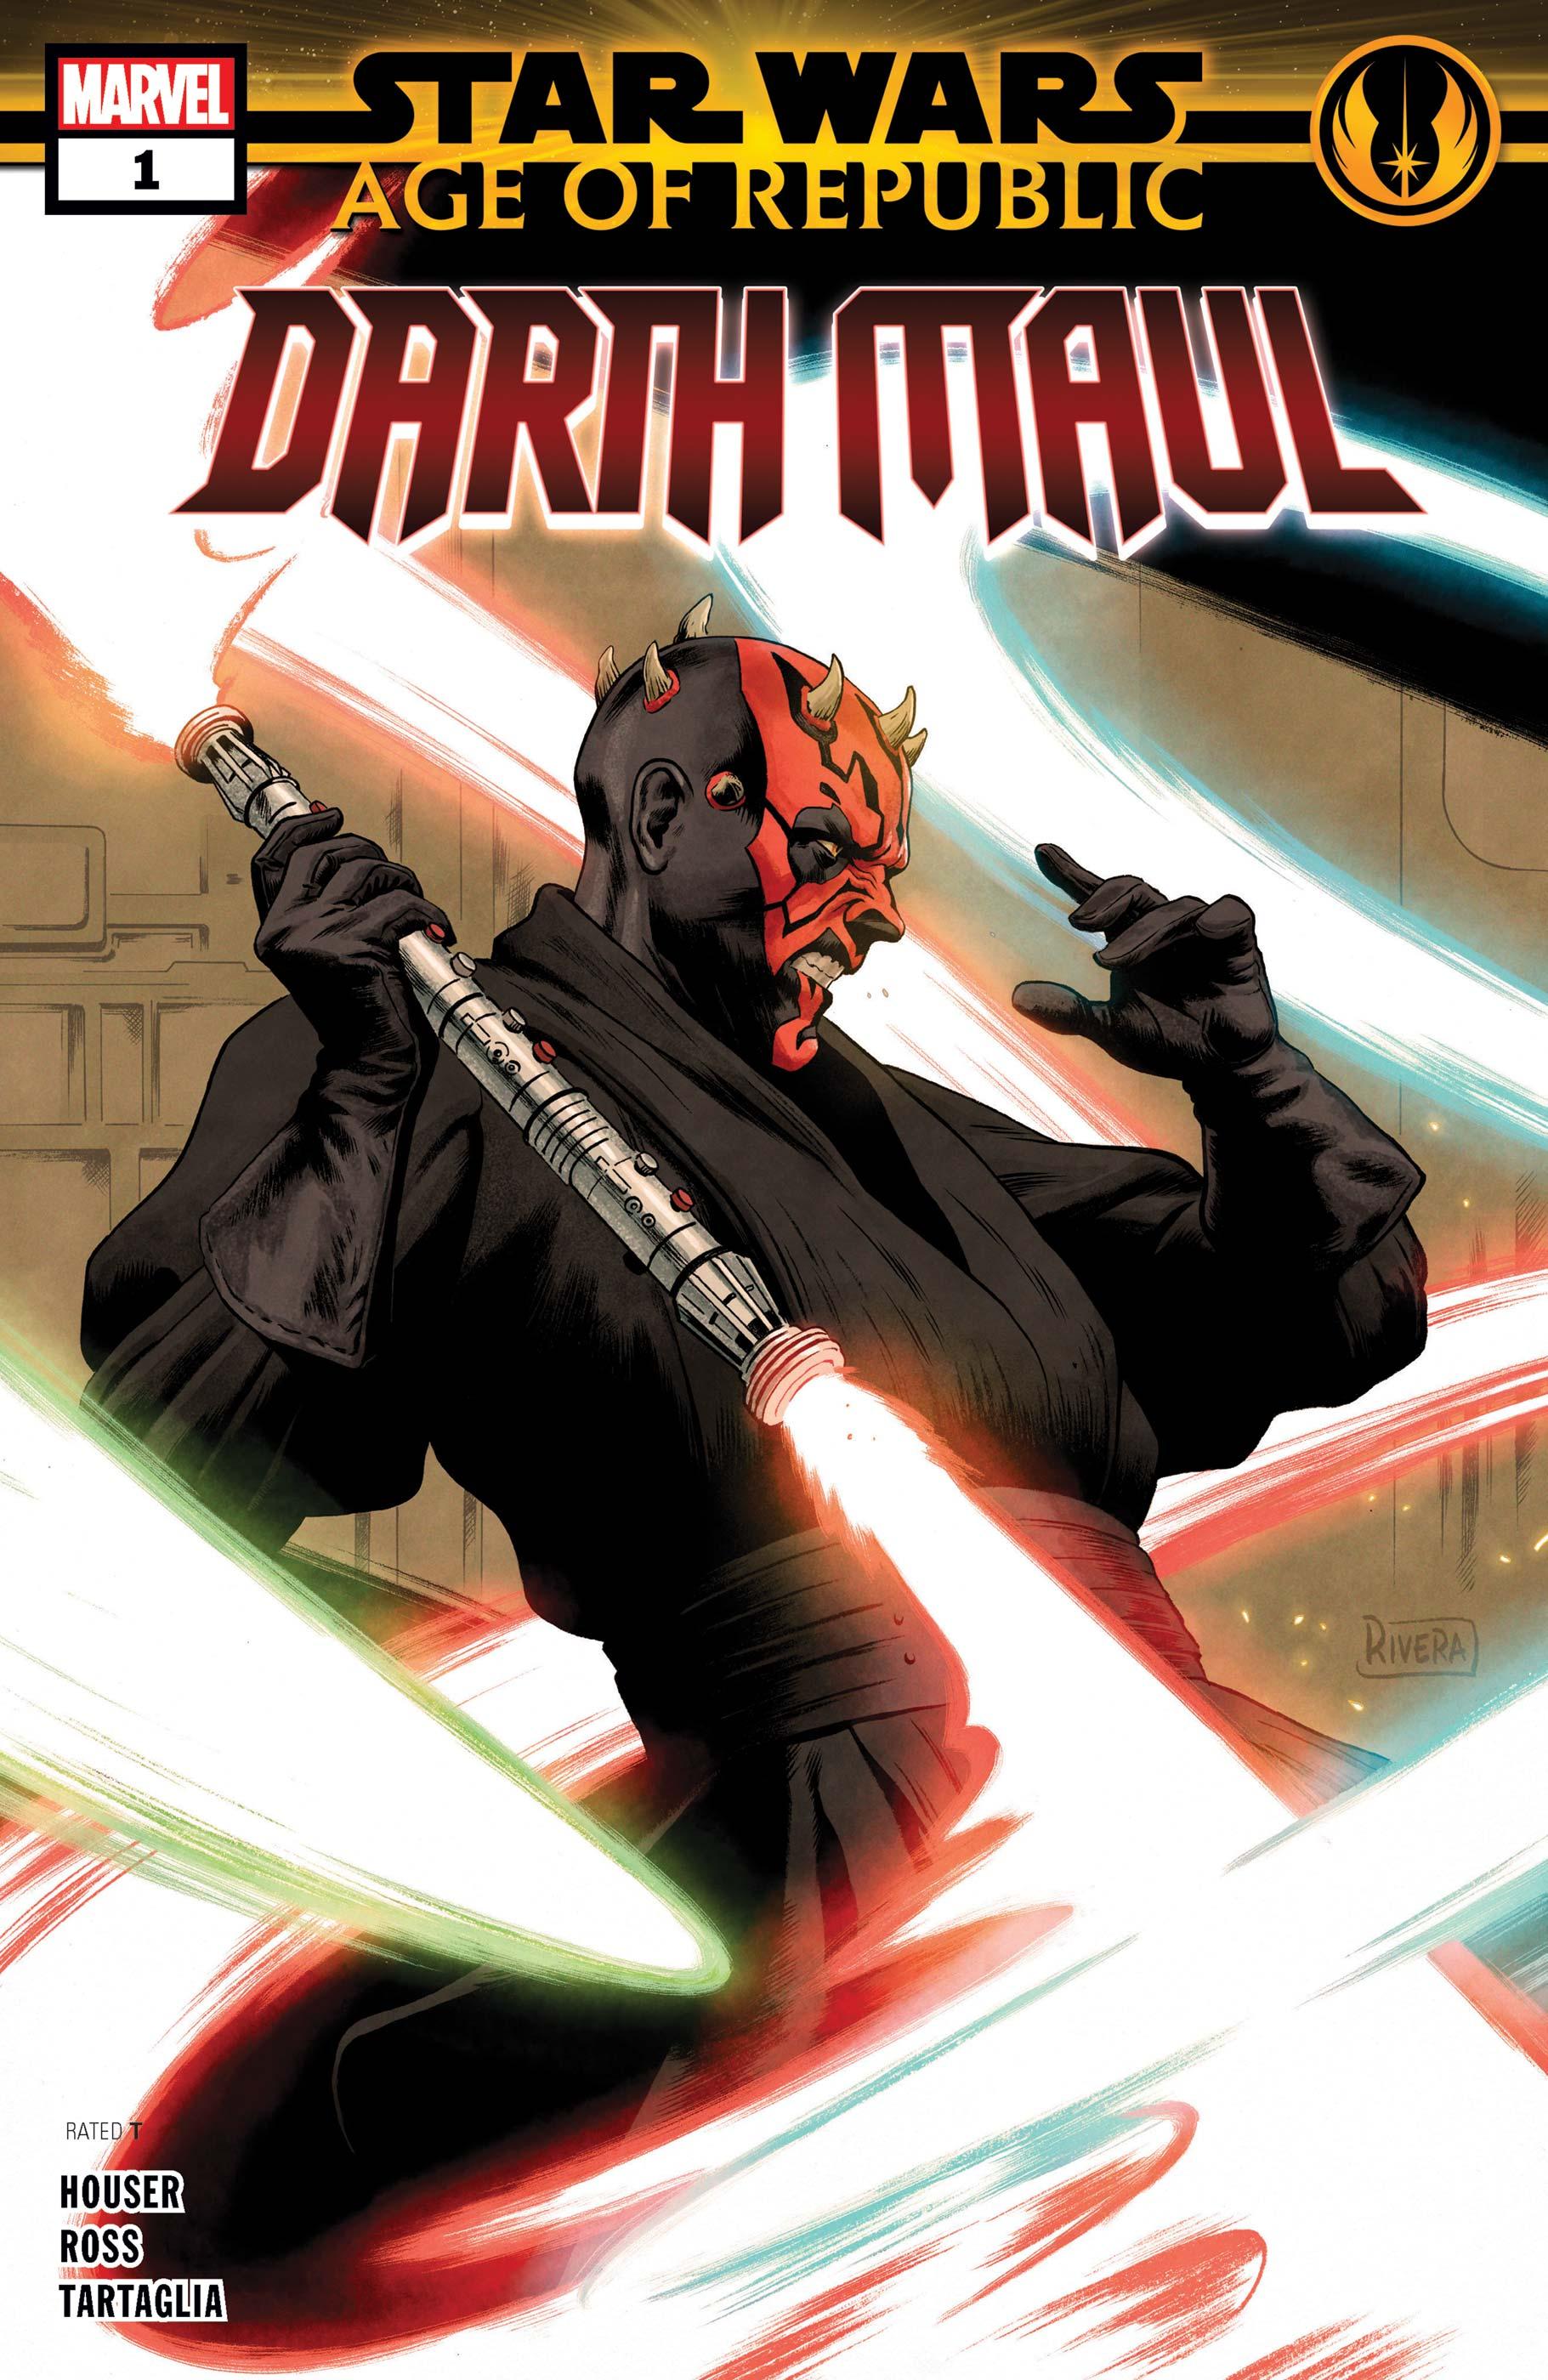 Star Wars: Age of Republic - Darth Maul (2018) #1